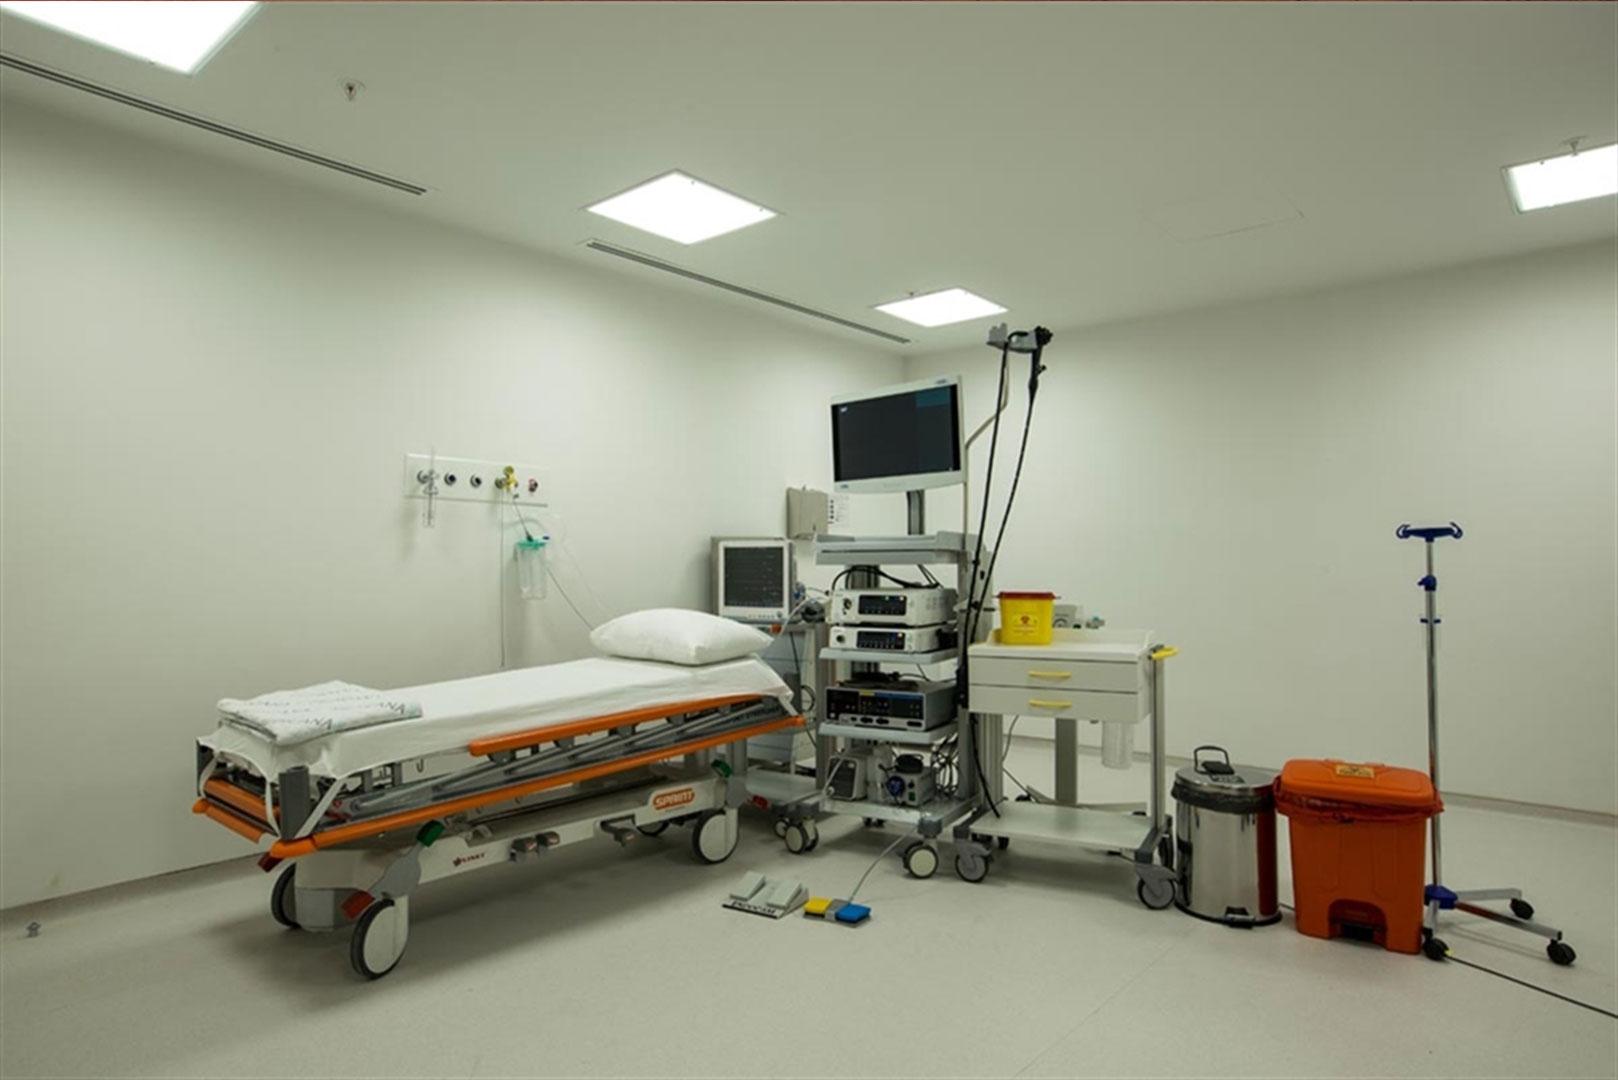 https://www.medicanahealthpoint.com/wp-content/uploads/2020/10/medicana-bursa-5.jpg